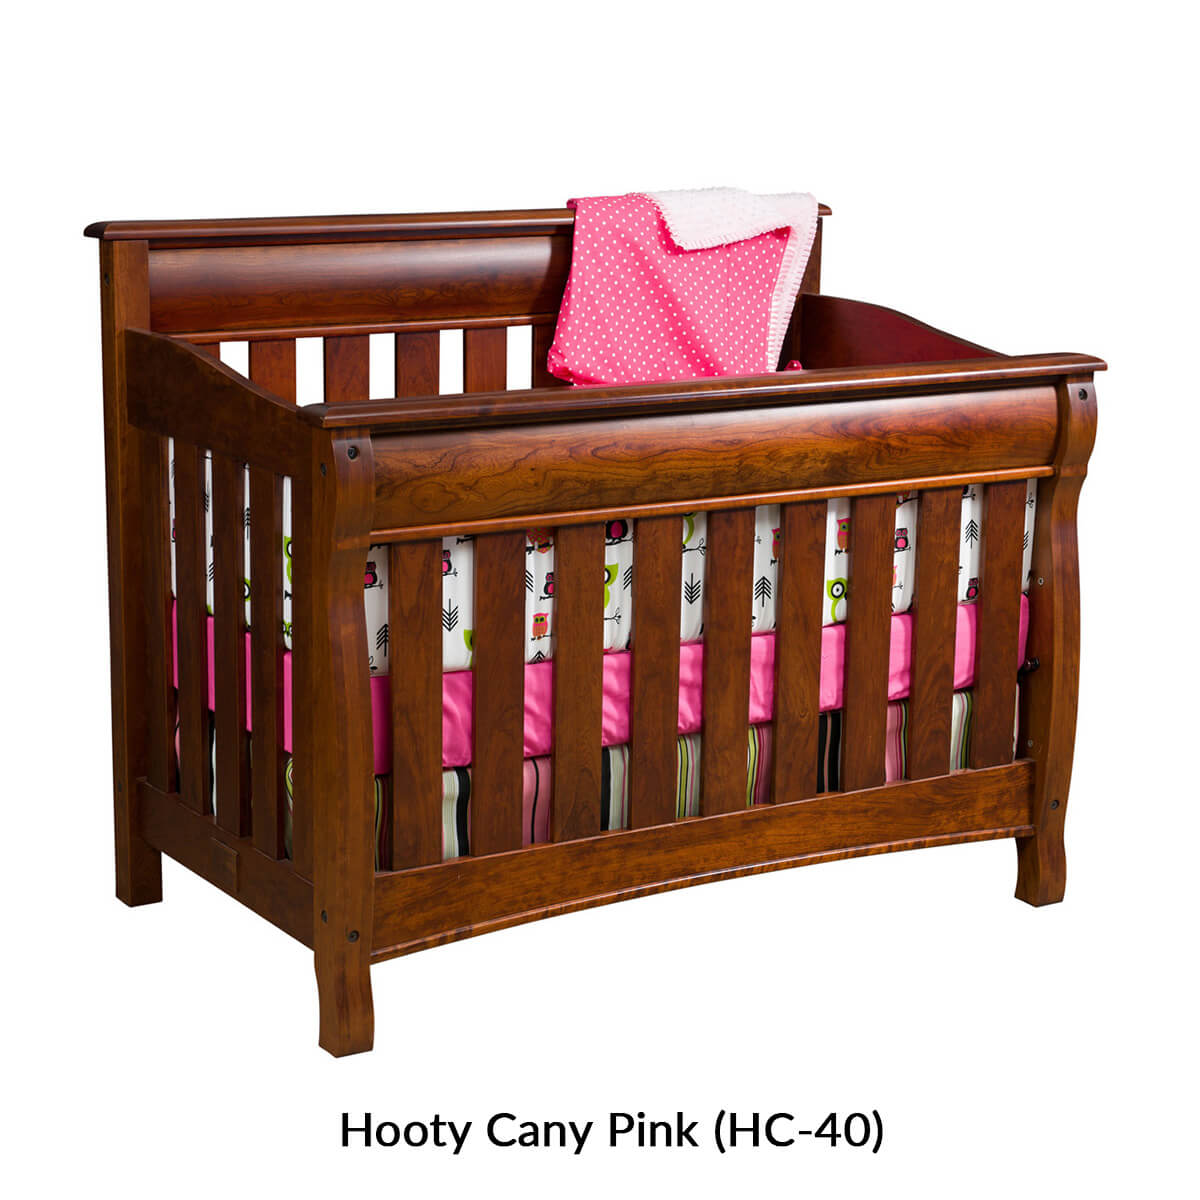 18.-hooty-candy-pink-hc-40-.jpg